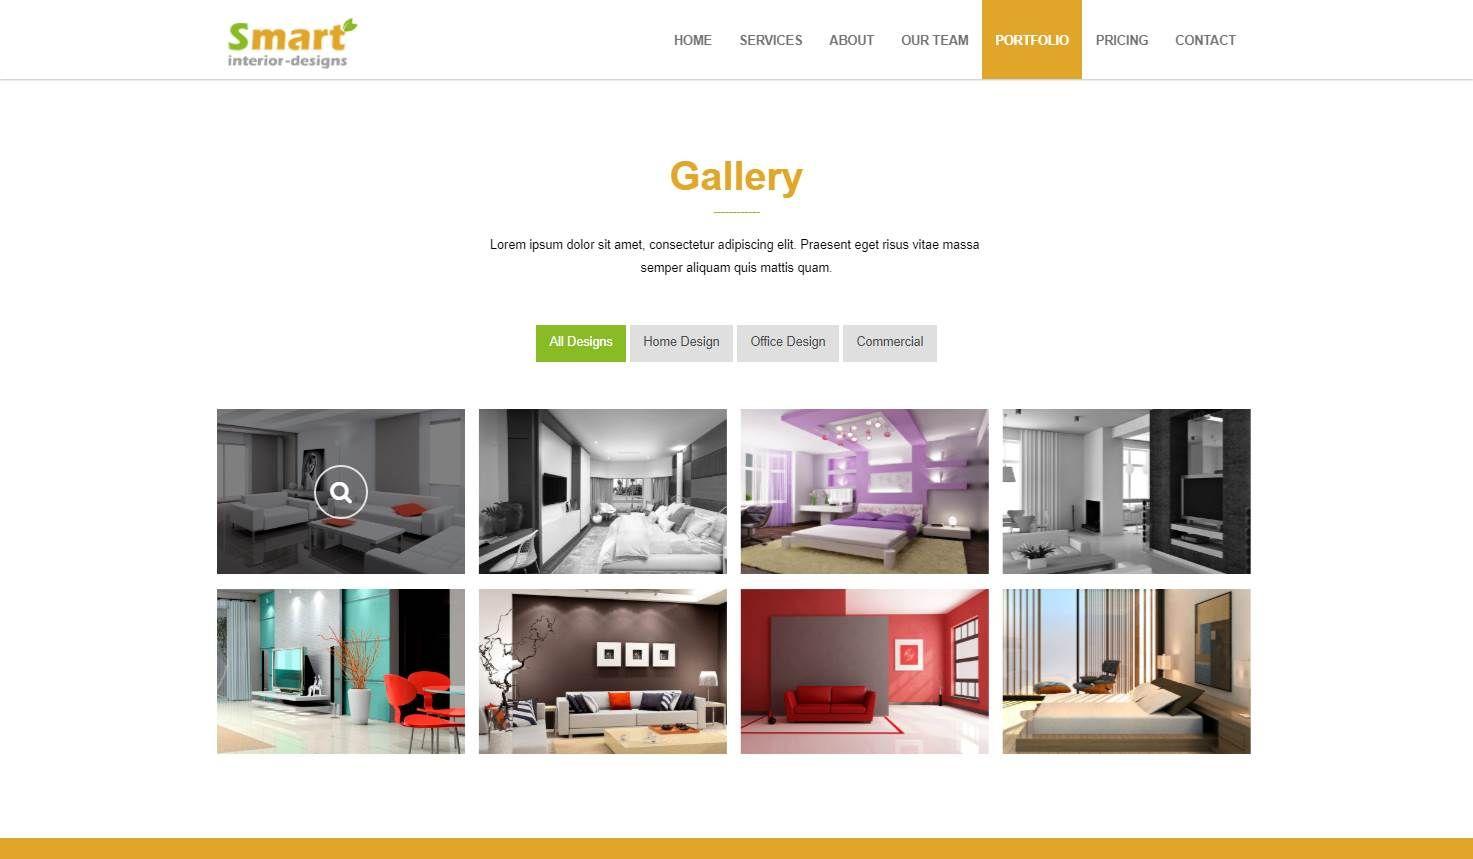 Smart Interior: An Interior Design Website Template